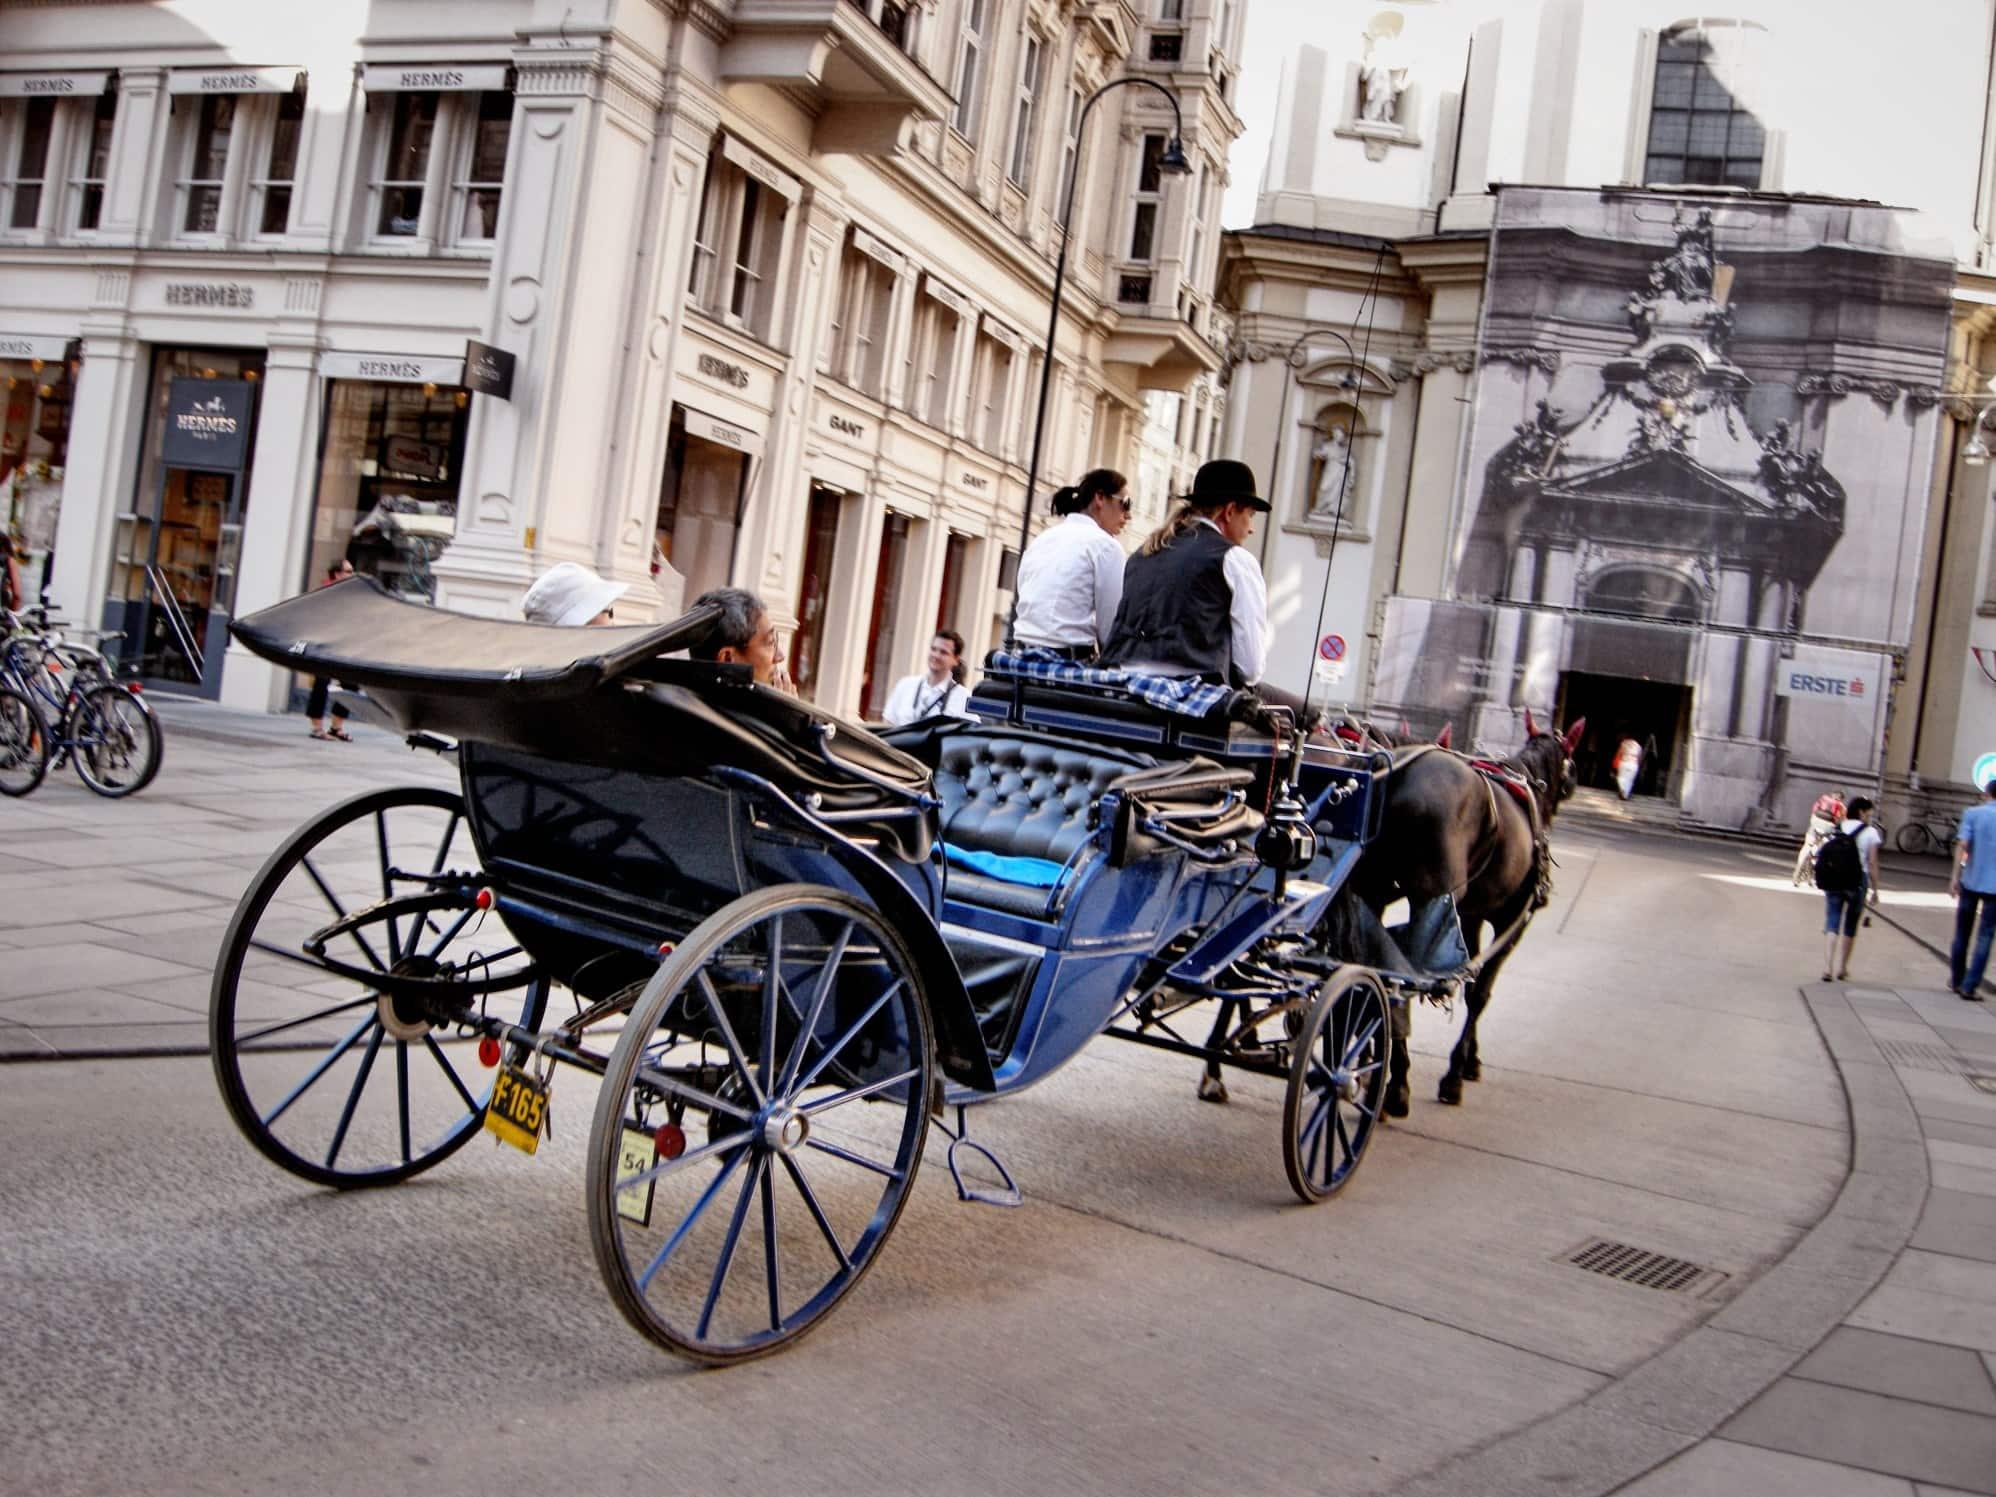 holiday in austria | travel to austria | austria travel guide | innsbruck austria